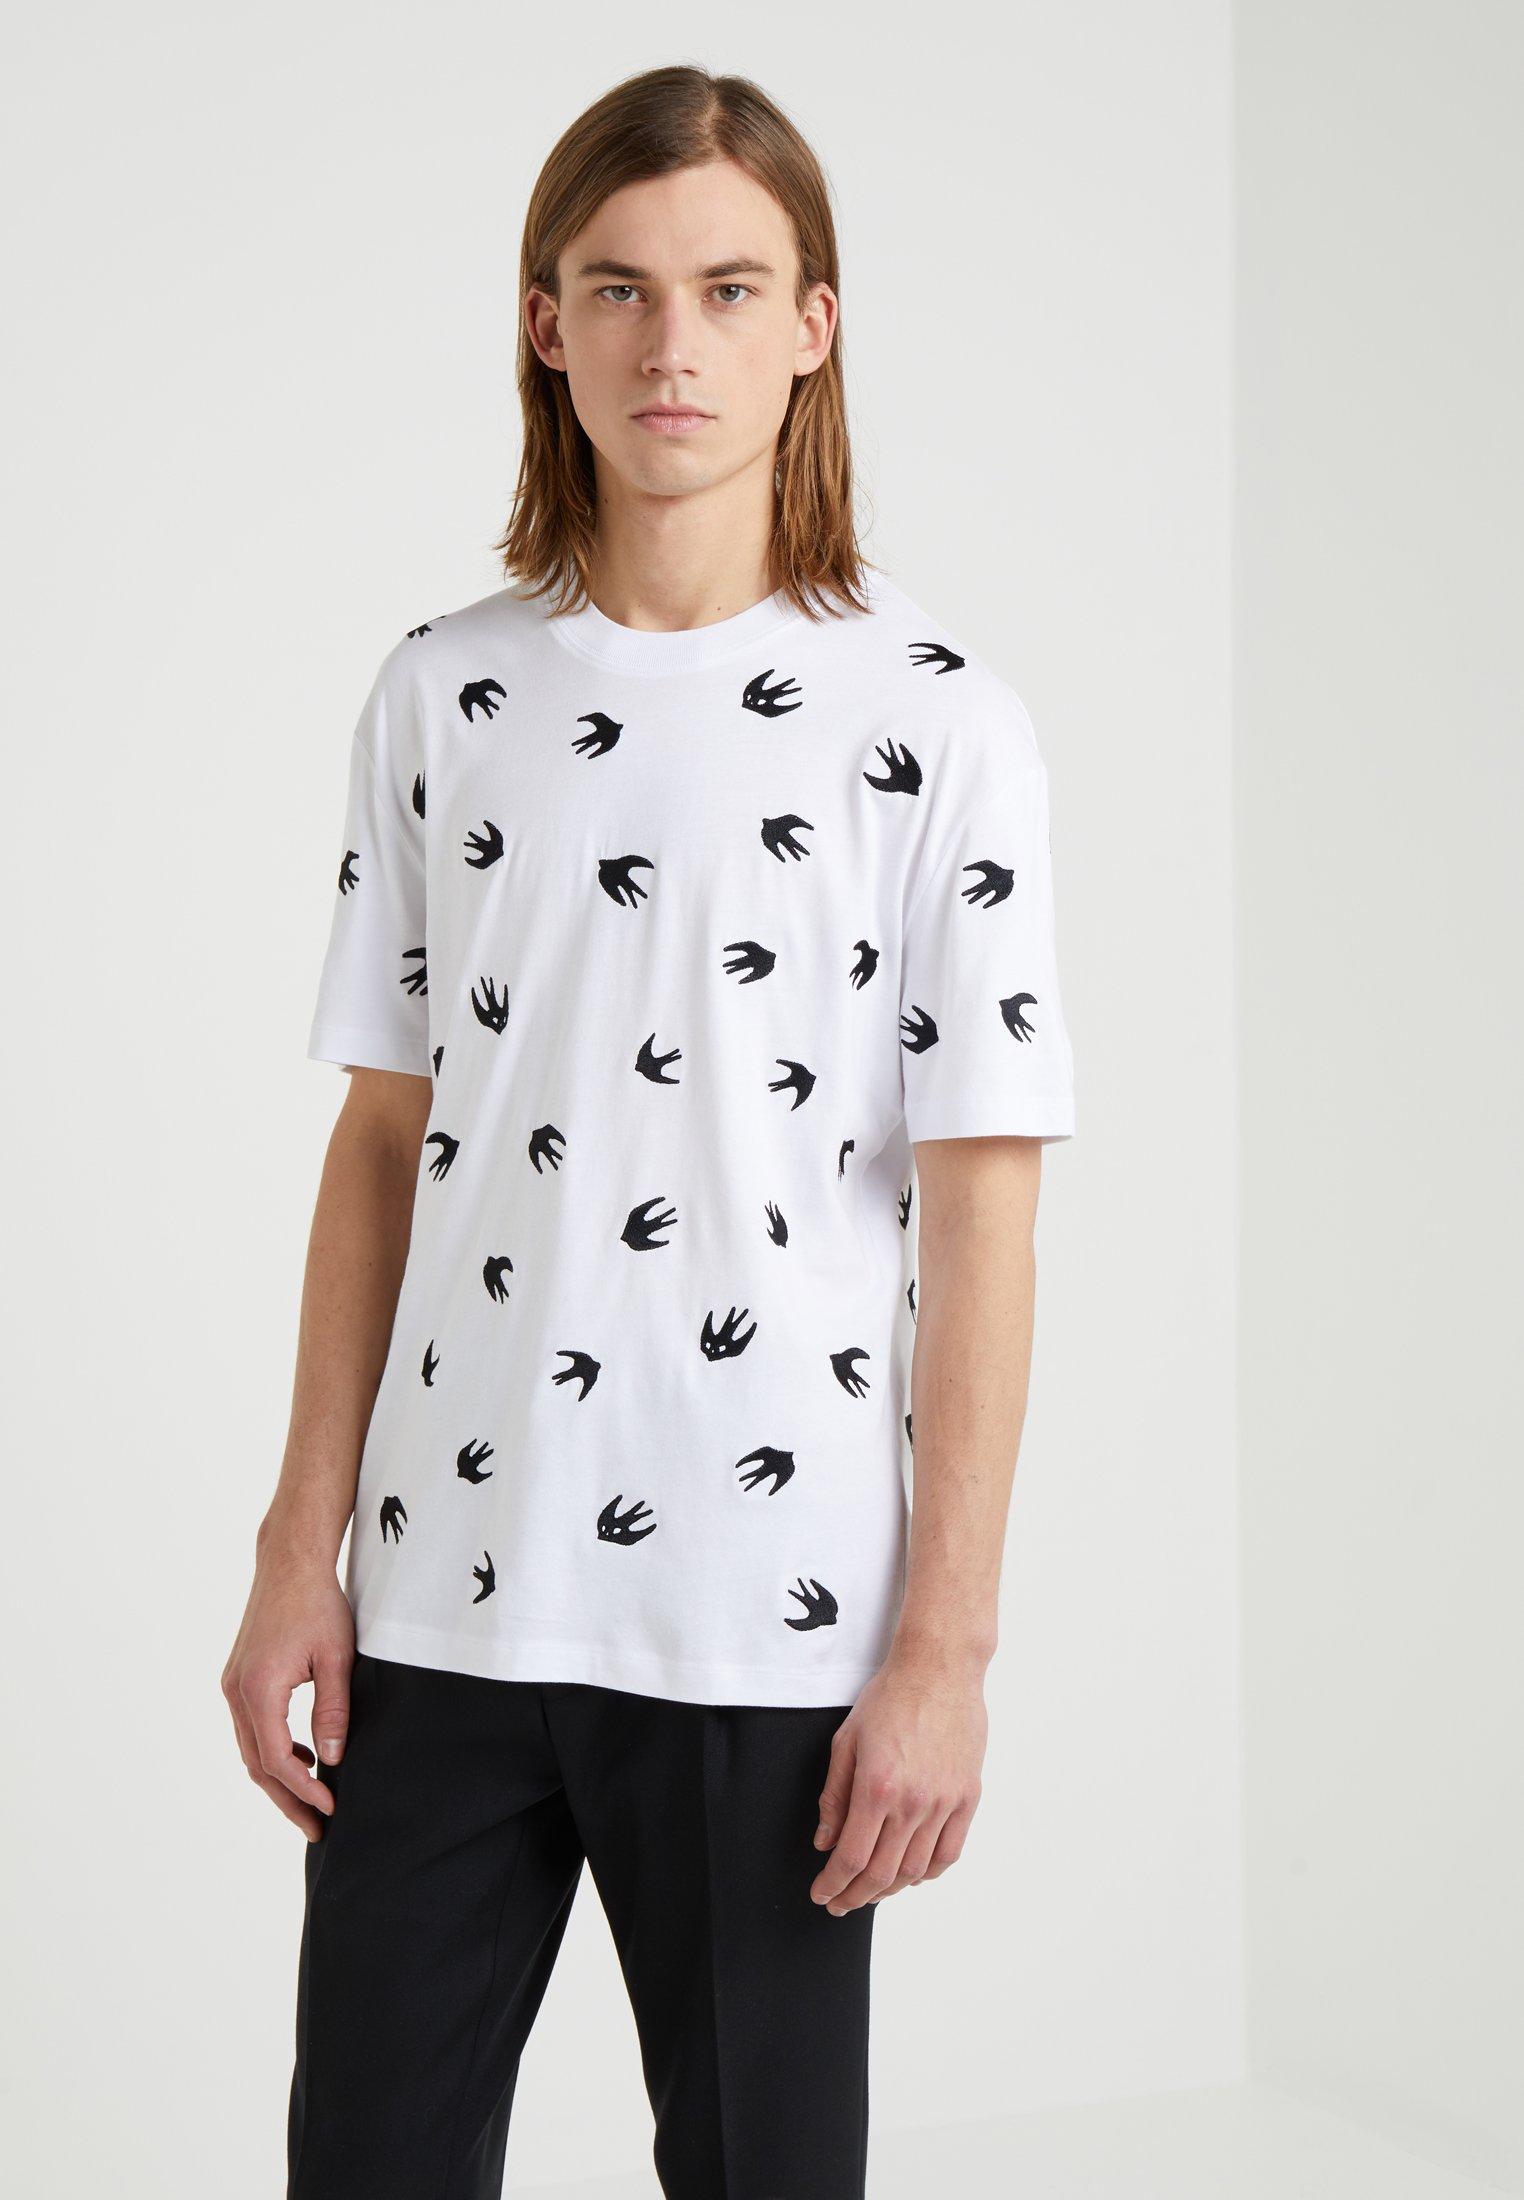 Imprimé Mcq Mcqueen shirt Alexander Dropped TeeT Optic Shoulder White 0mNw8n